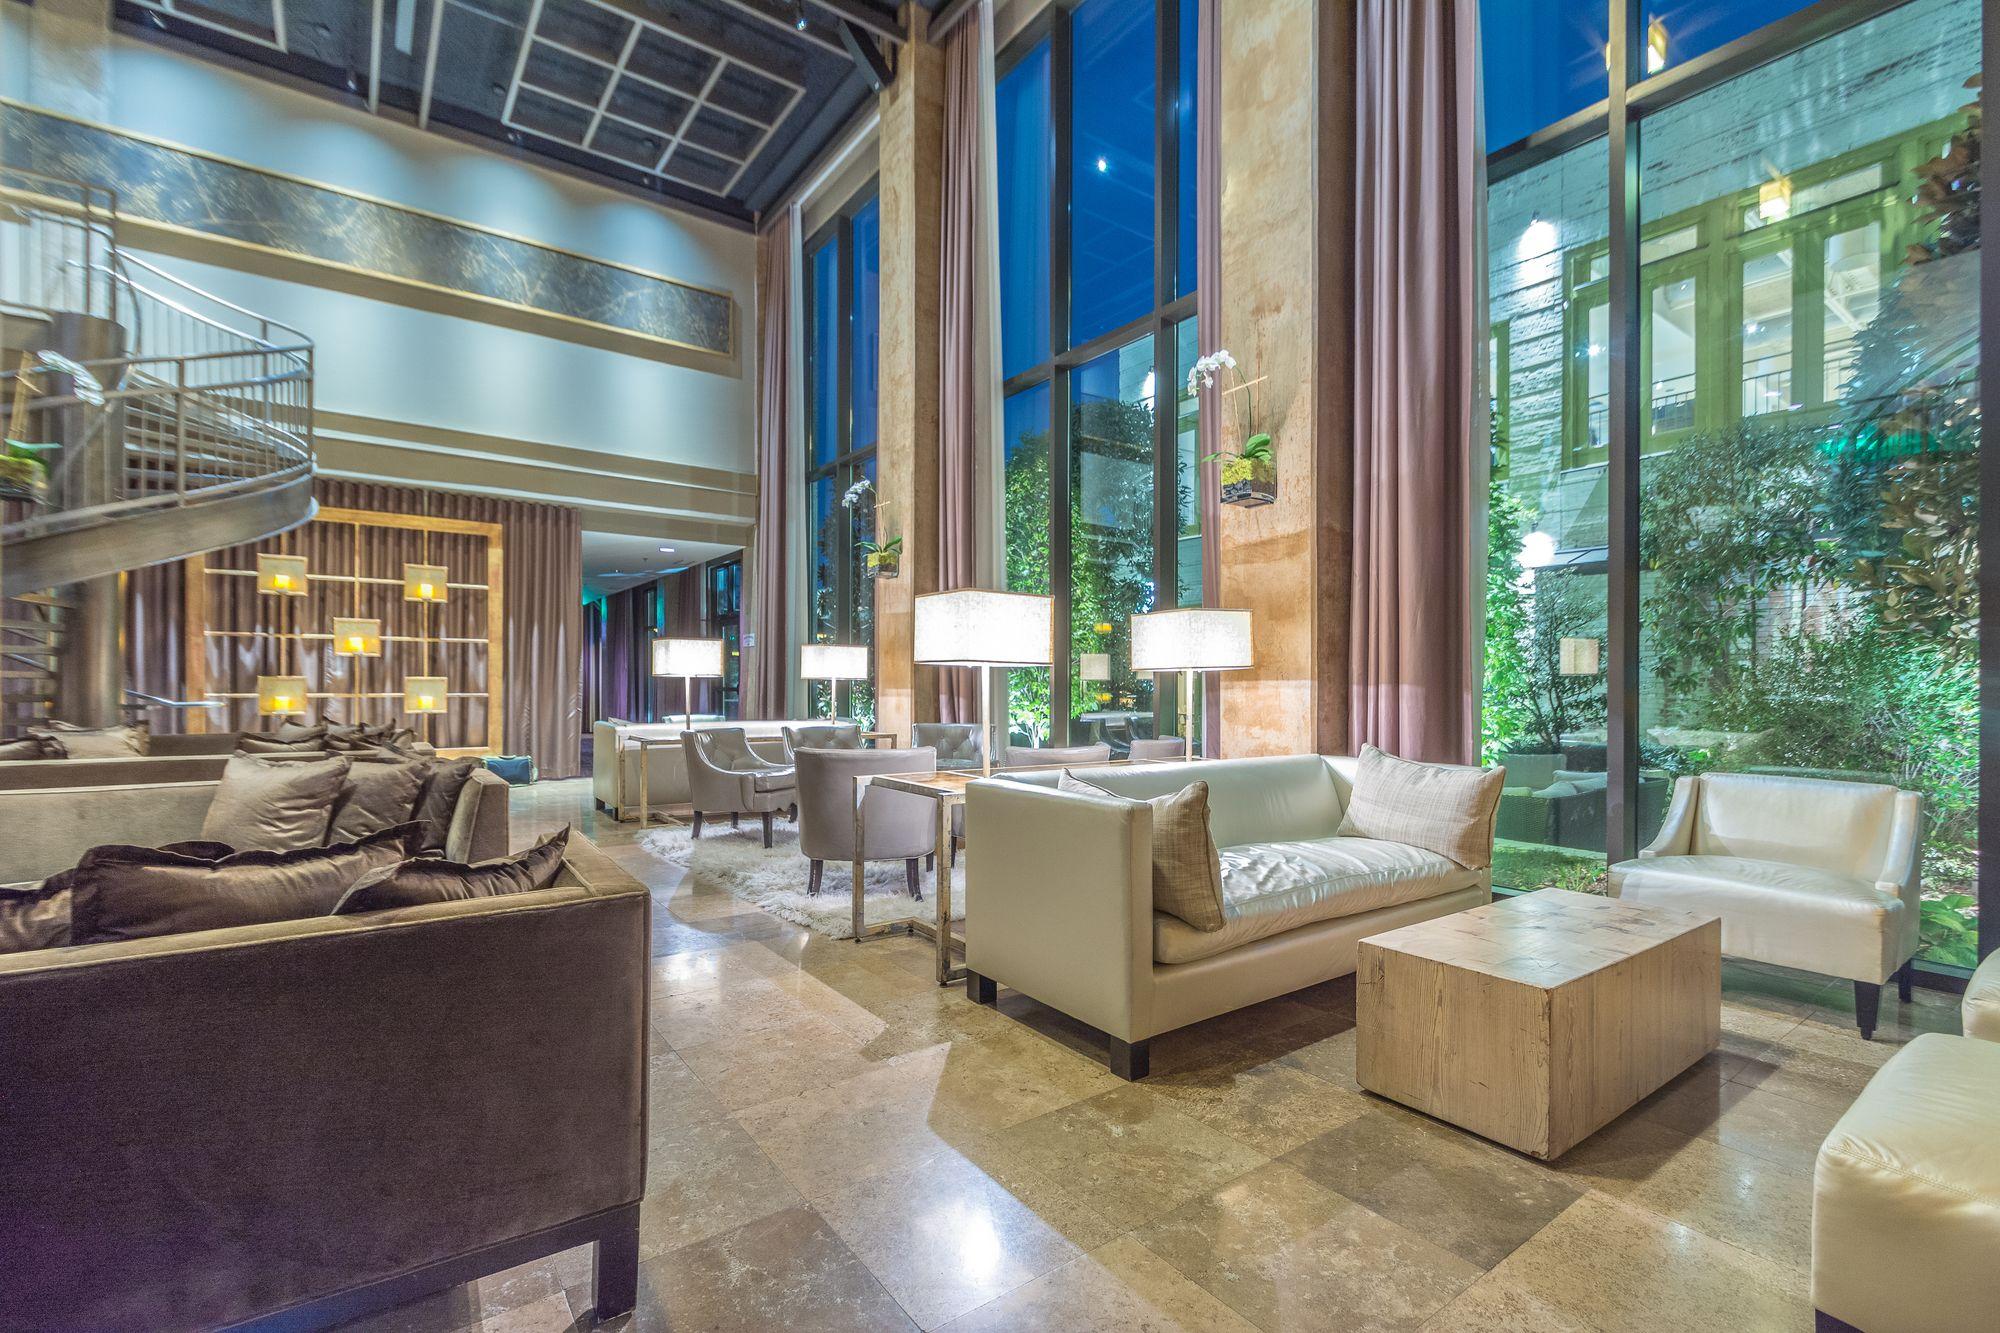 Proximity Hotel in Greensboro, NC